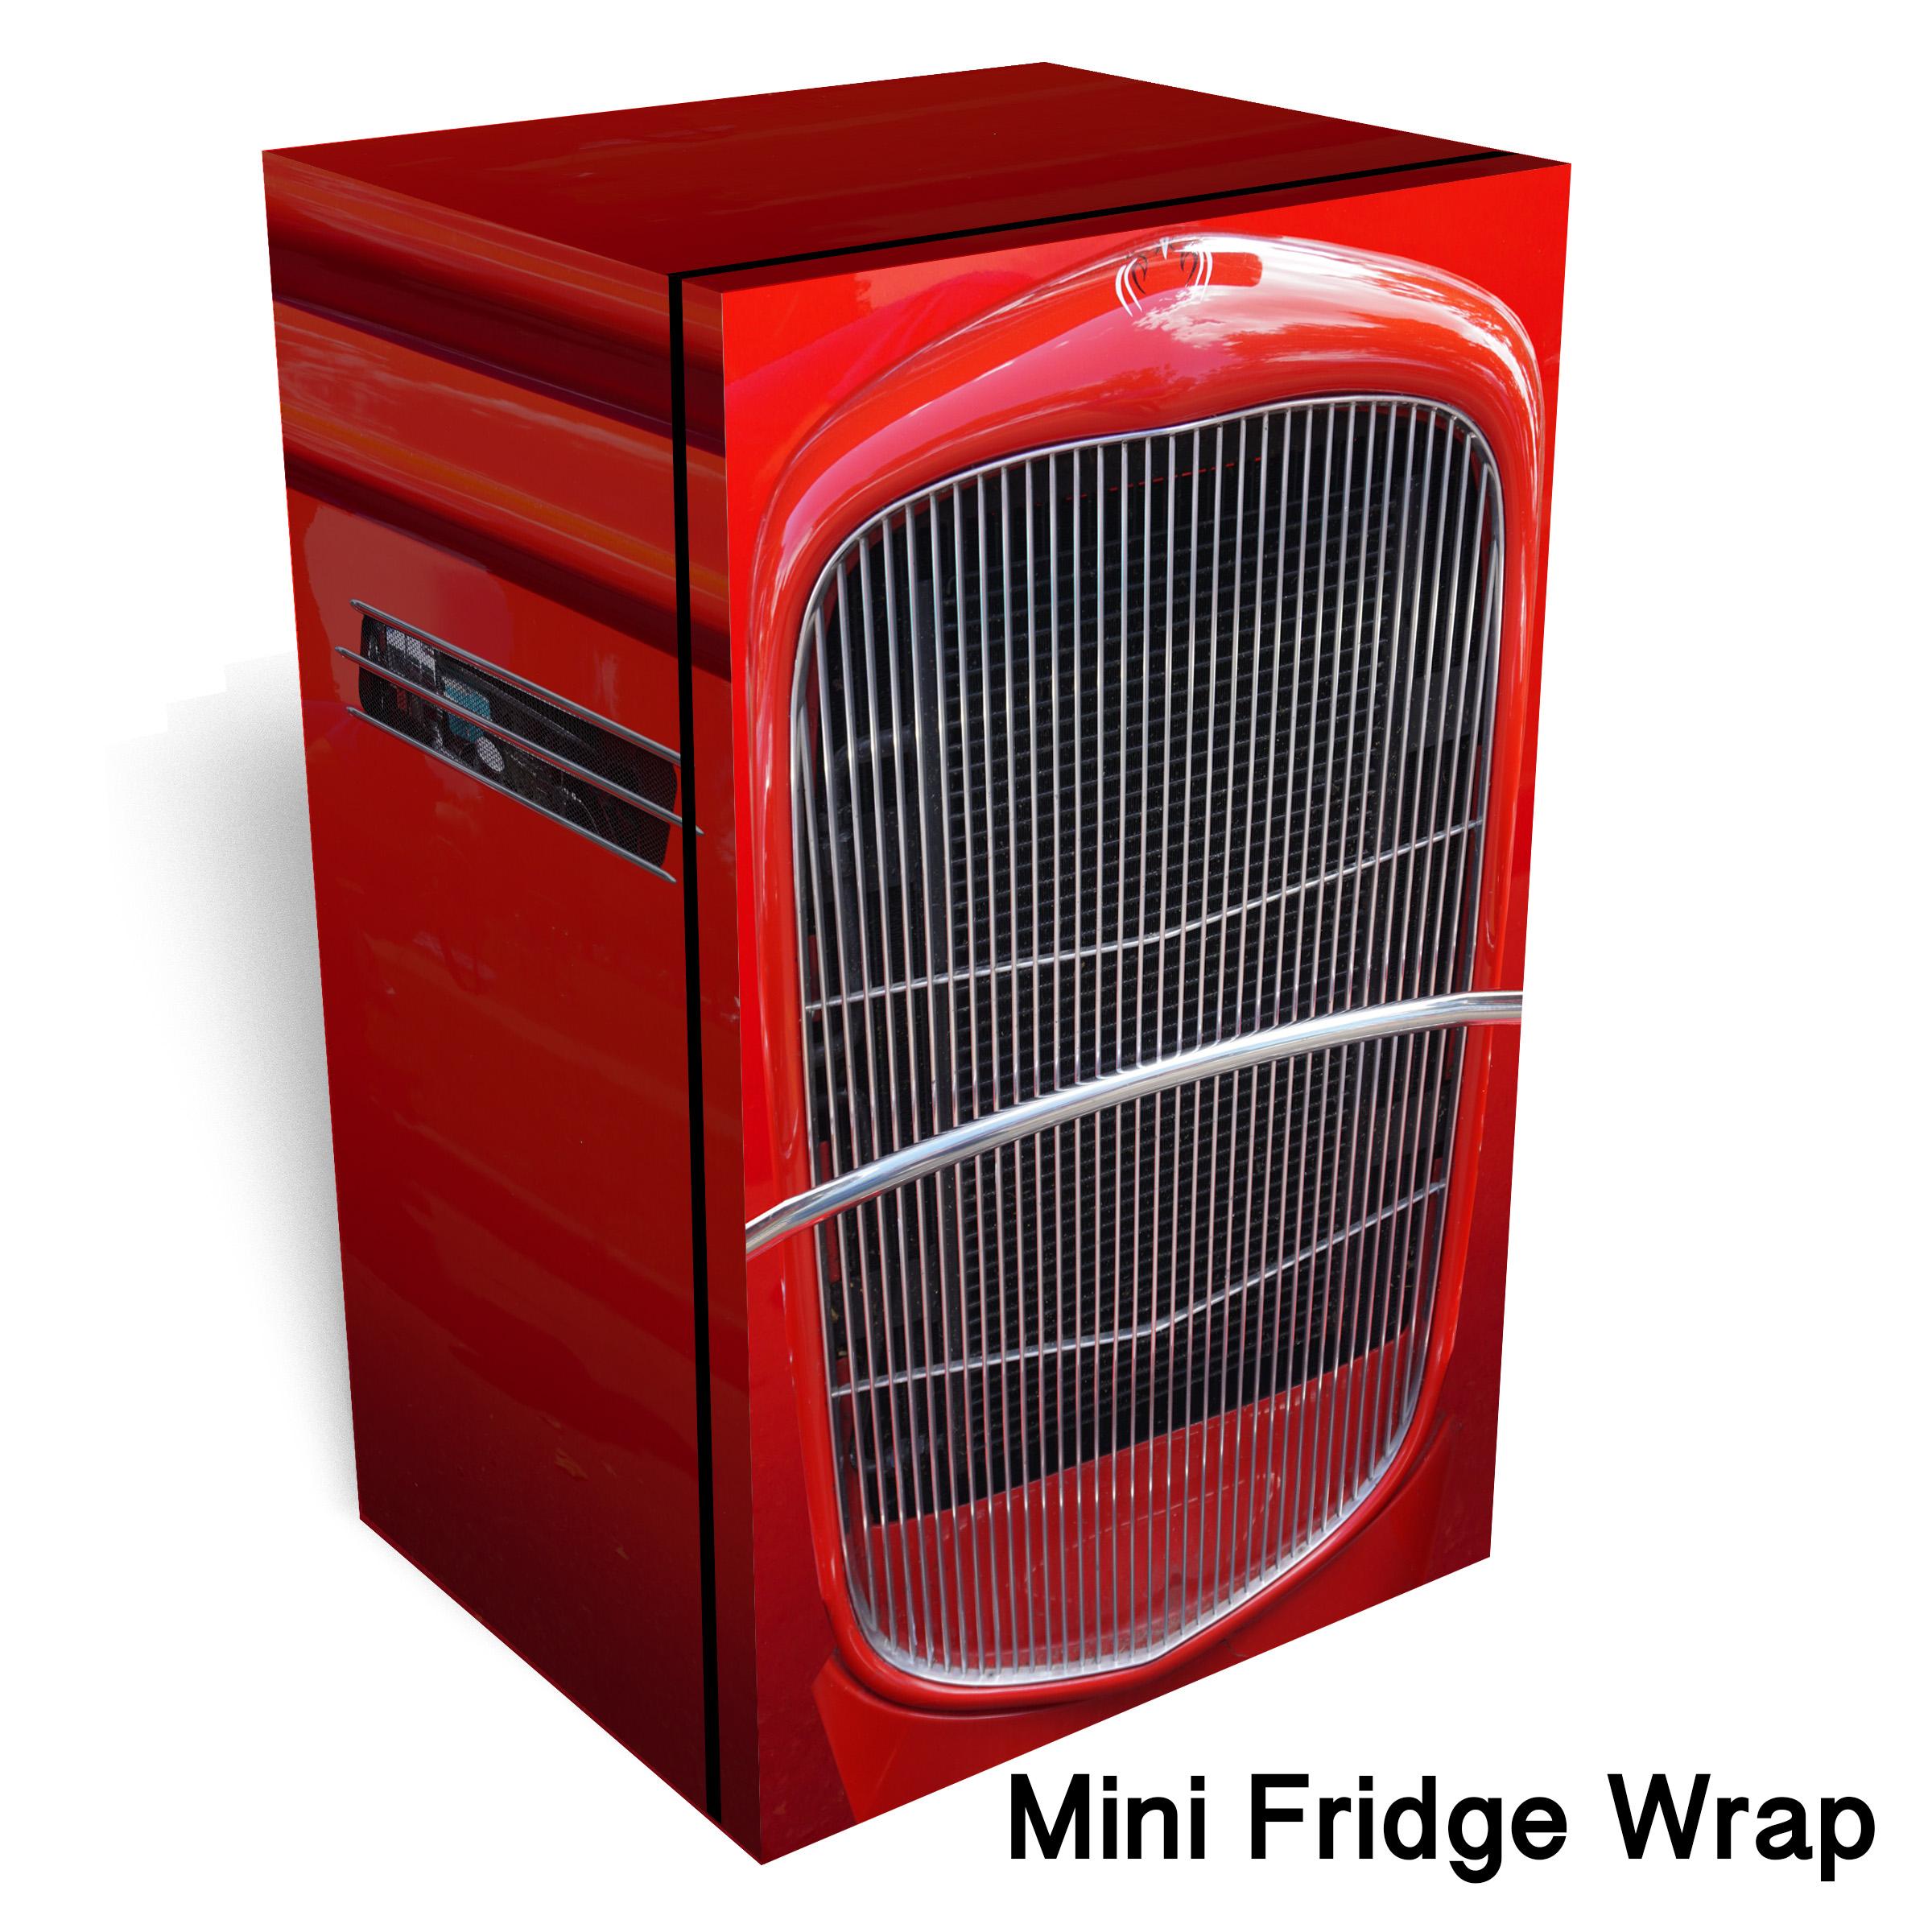 Hot Rod Red 2 Mini Fridge Wrap